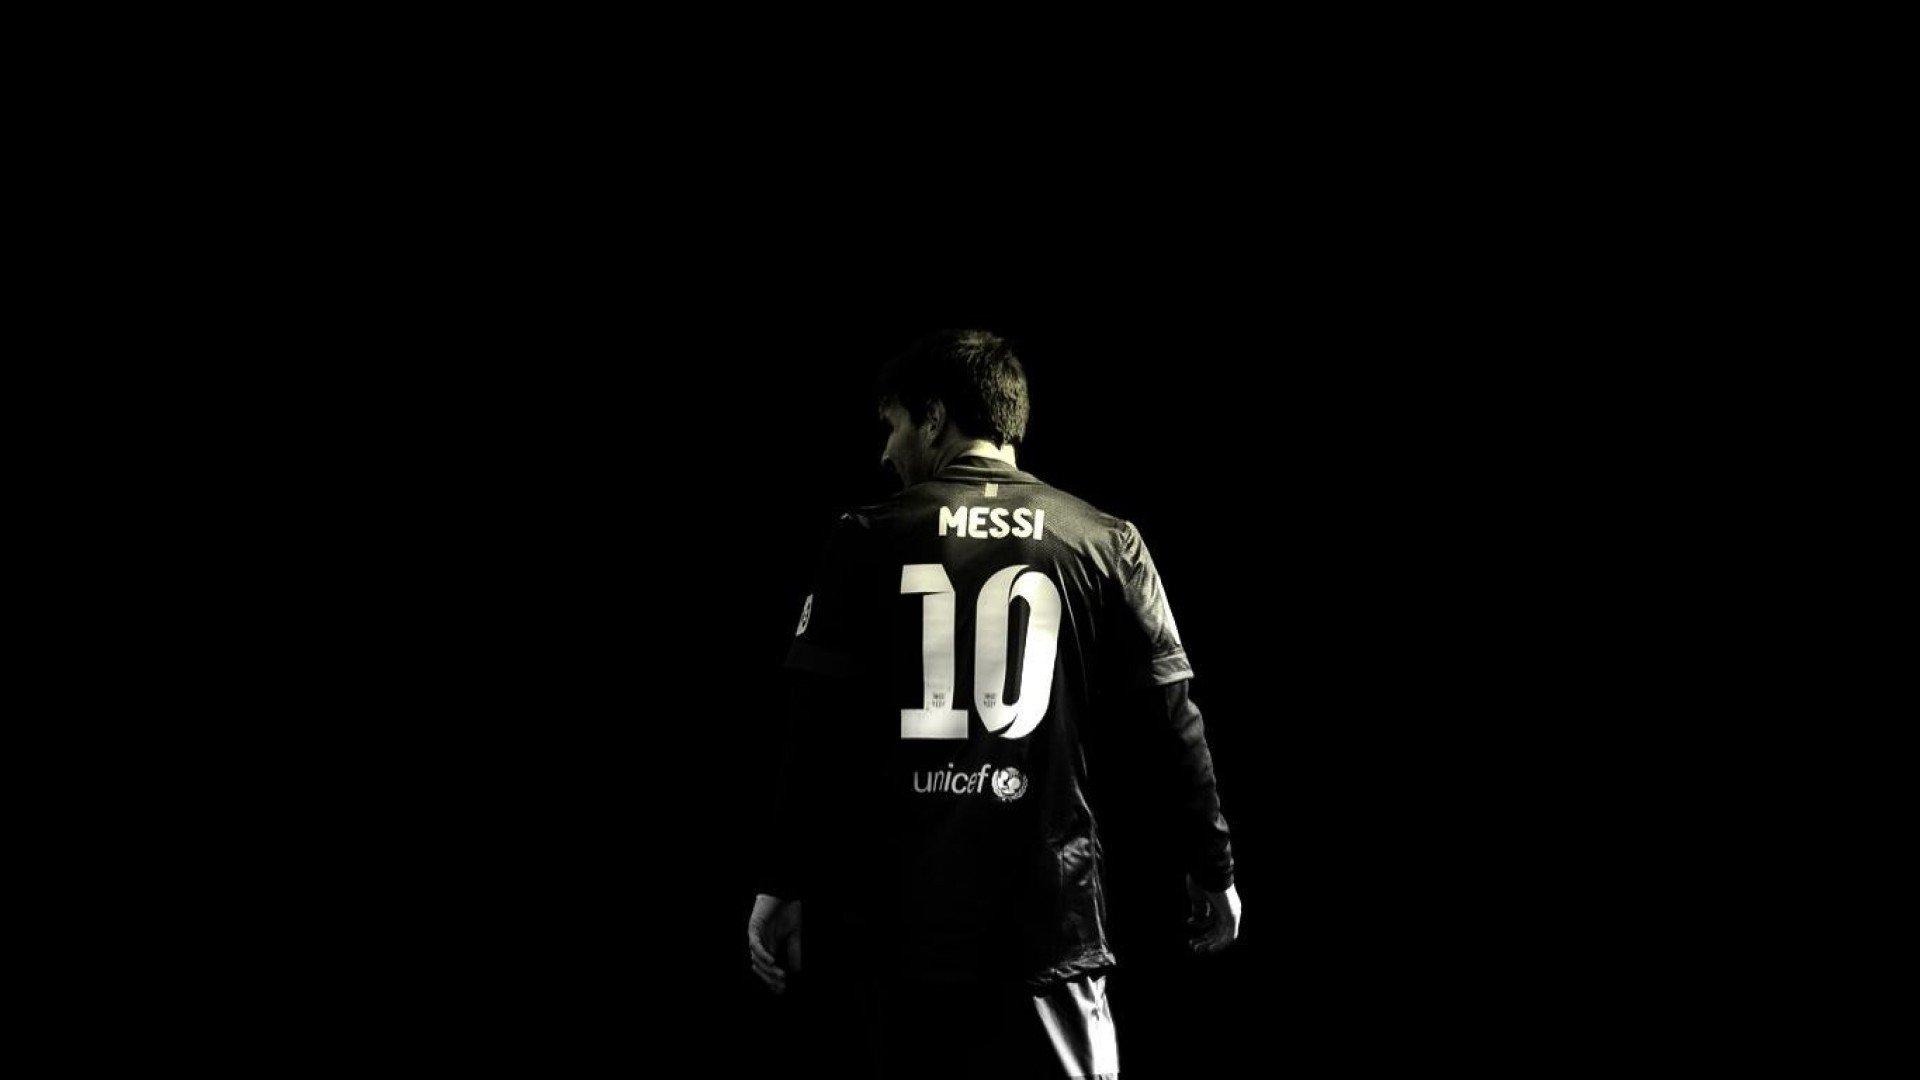 Lionel Messi Hd Wallpapers 1080P wallpaper 1920x1080 582725 1920x1080